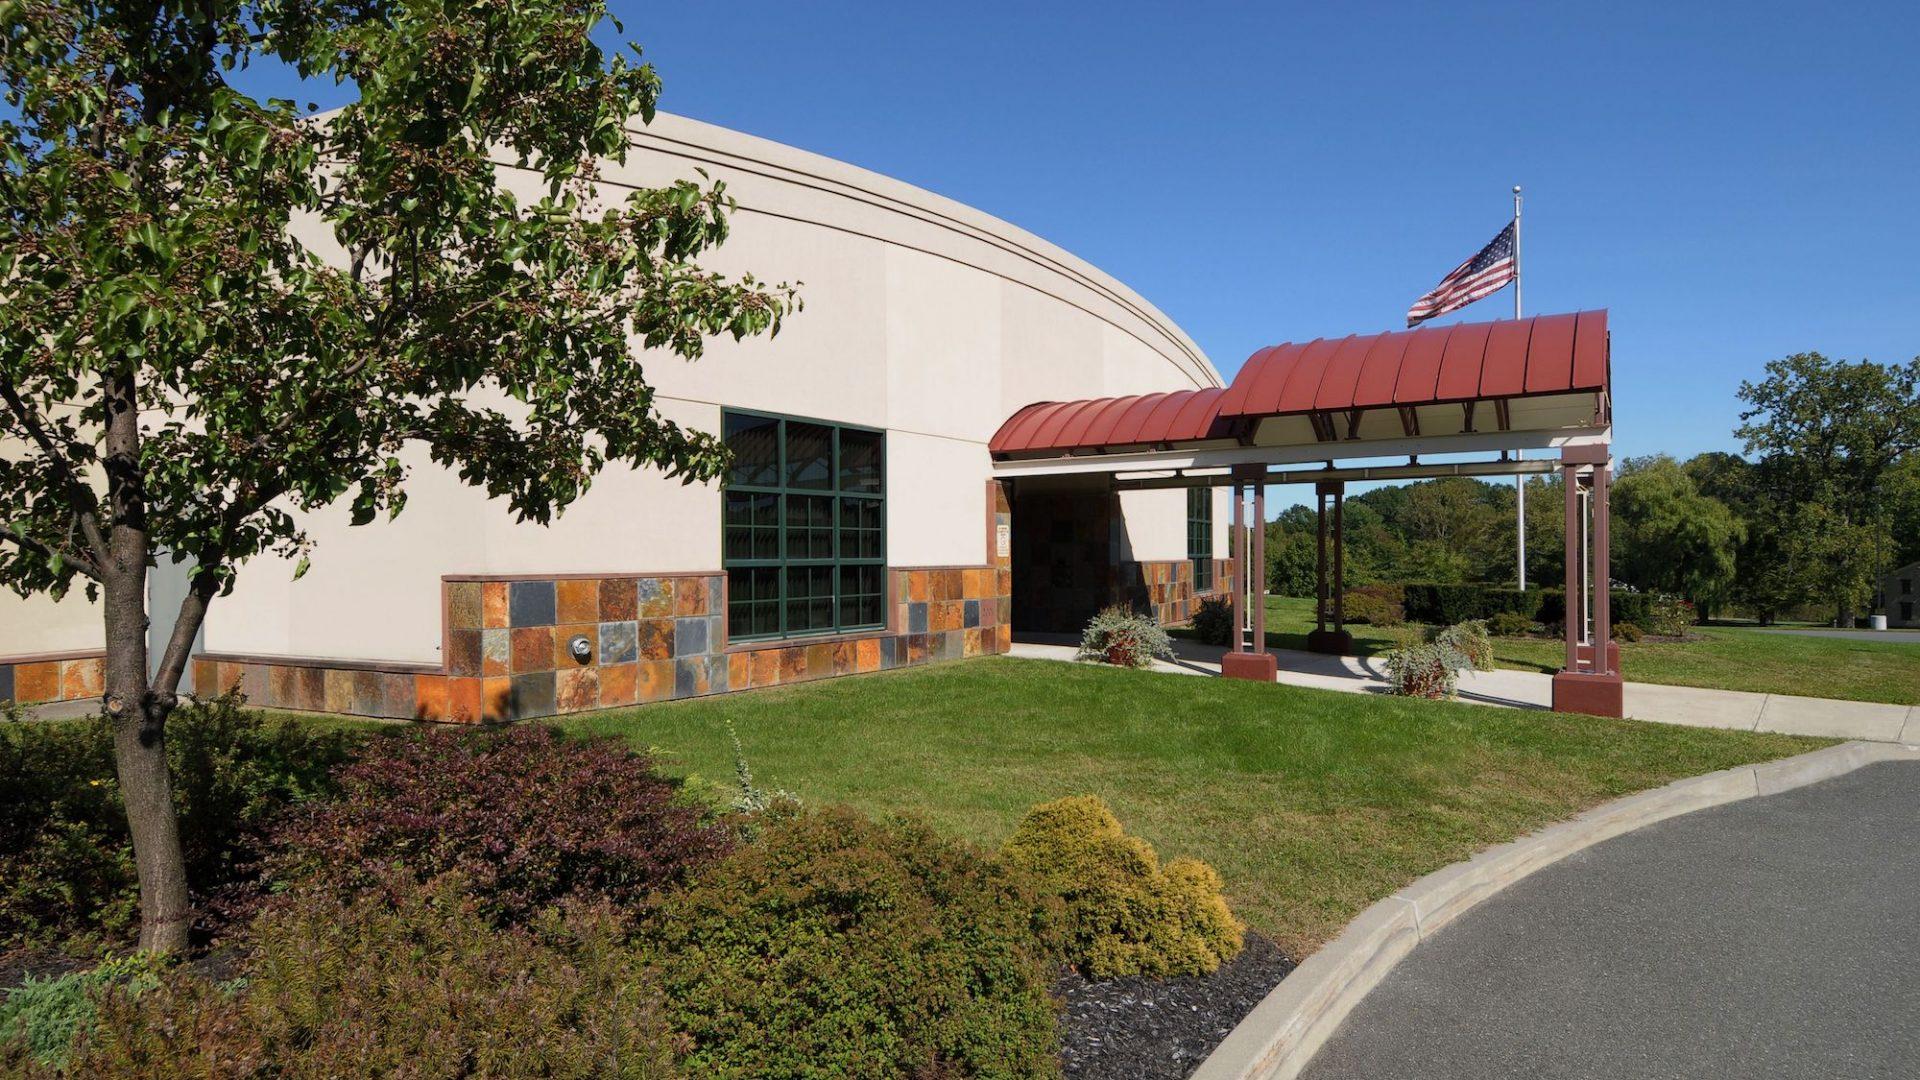 East Greenbush Public Library Exterior